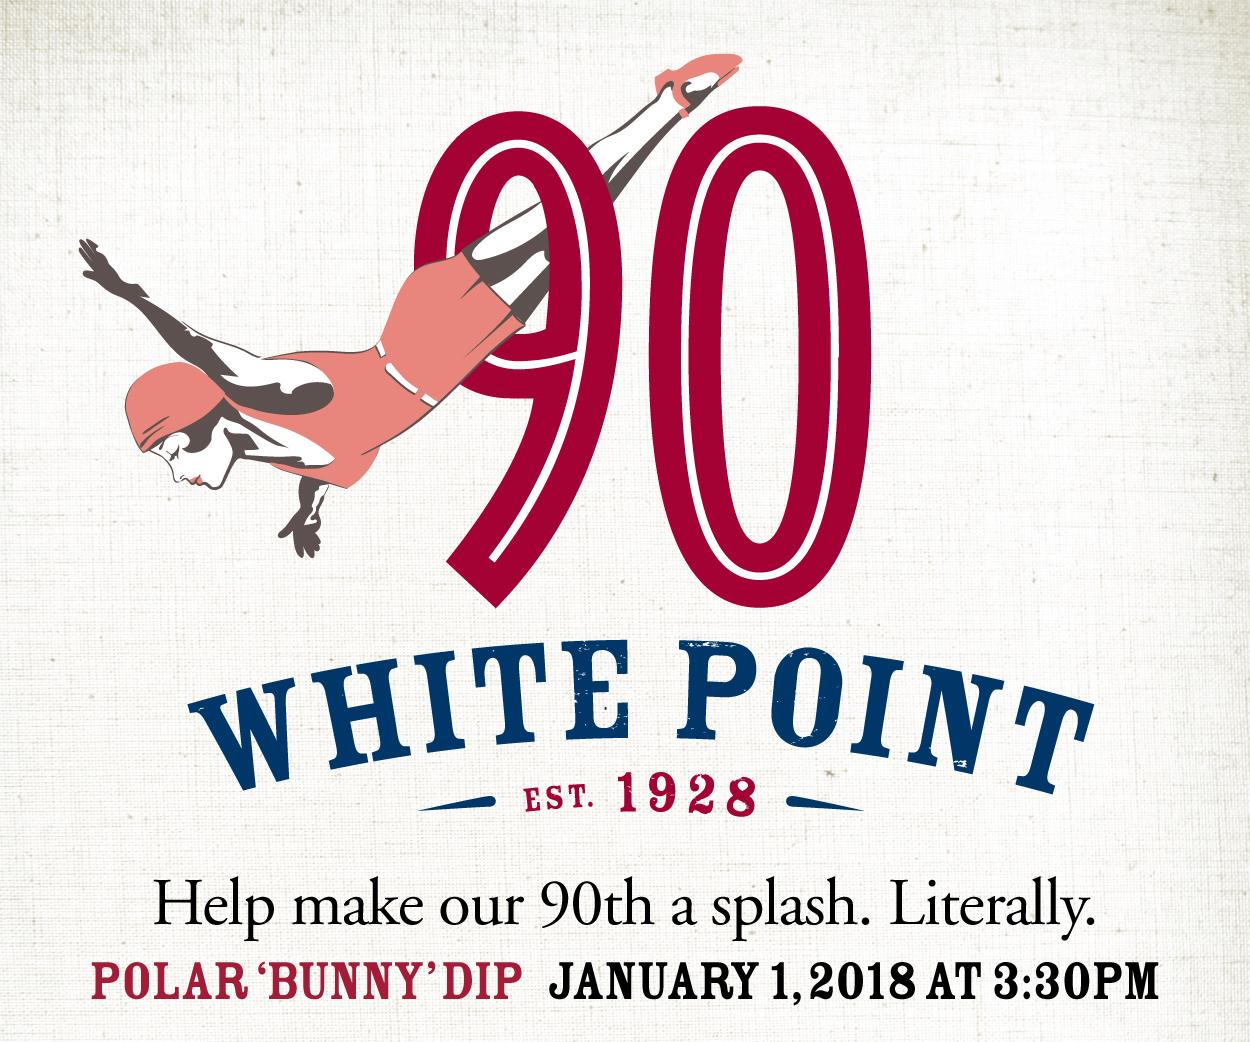 Polar Bunny Dip Jan 1 2018 at White Point Beach Resort